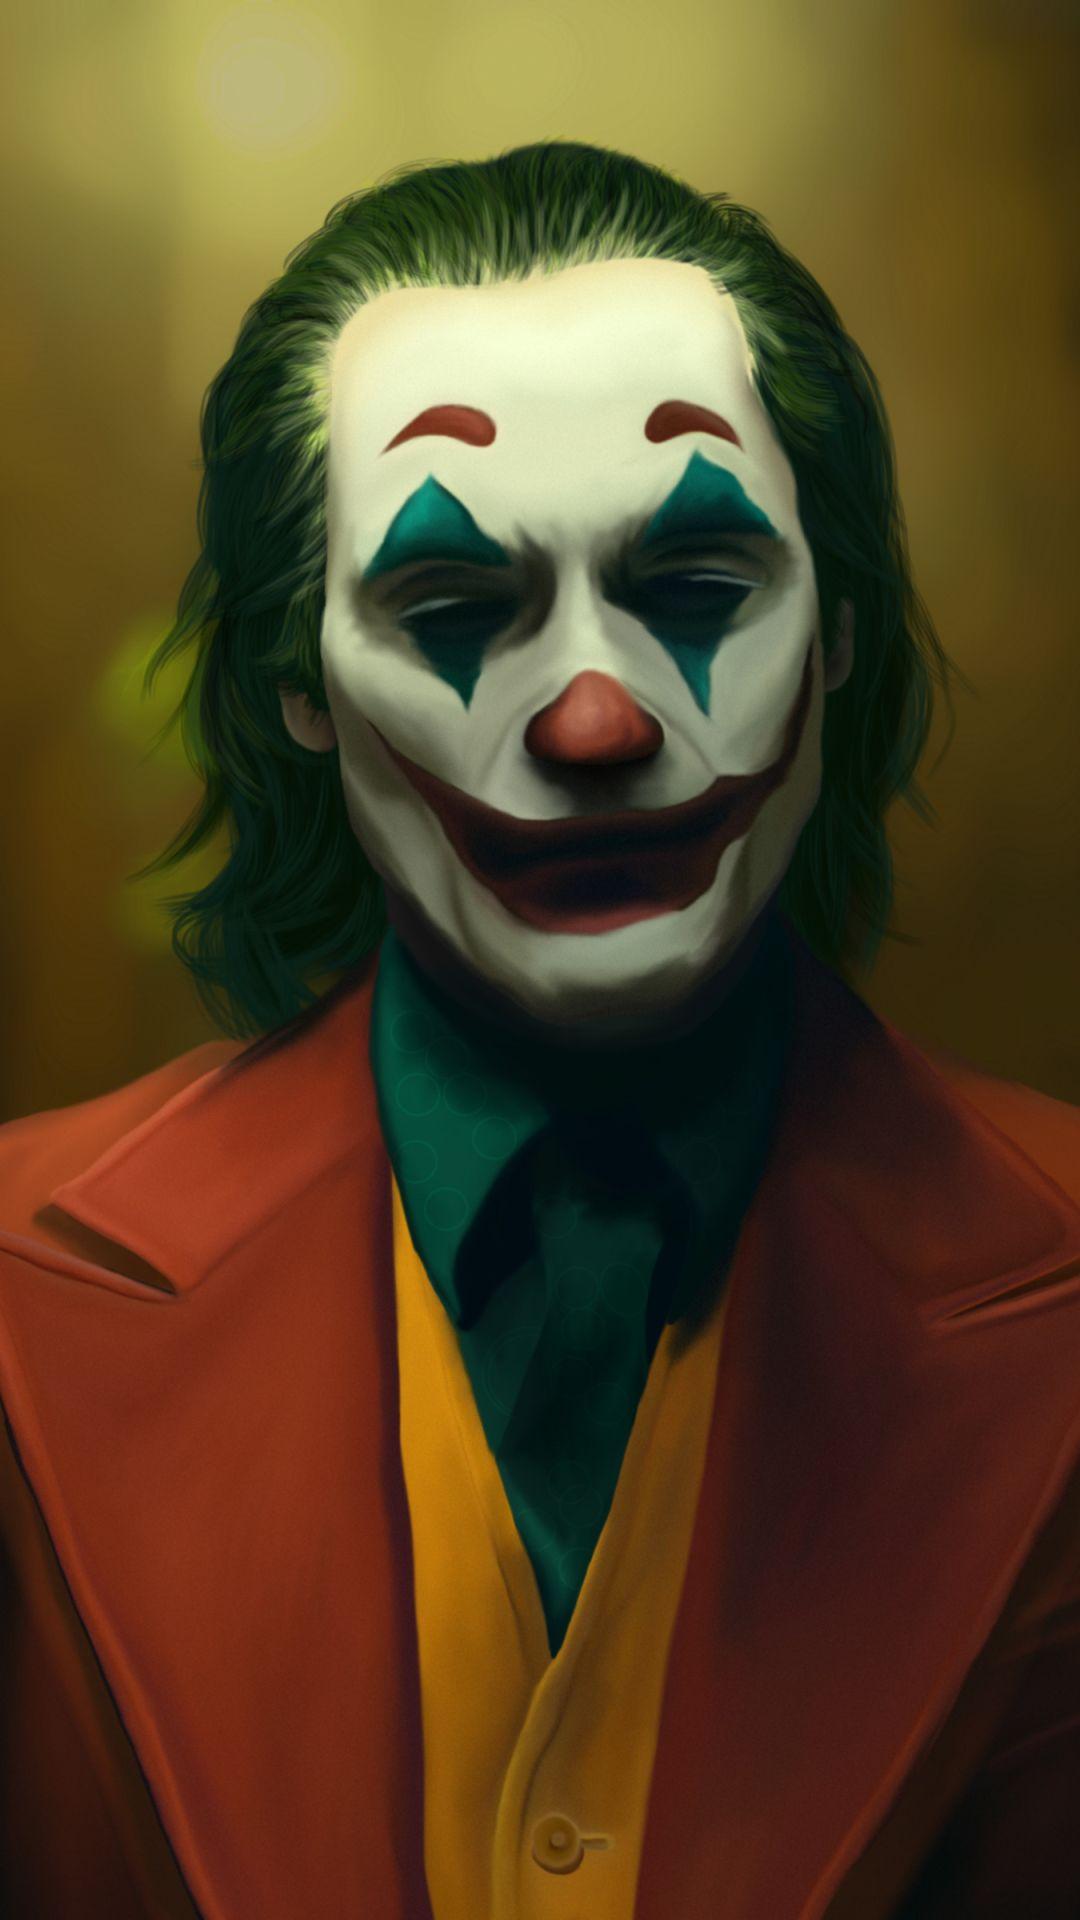 Download This Wallpaper Movie Joker 1080x1920 For All Your Phones And Tablets Joker Drawings Joker Hd Wallpaper Joker Halloween